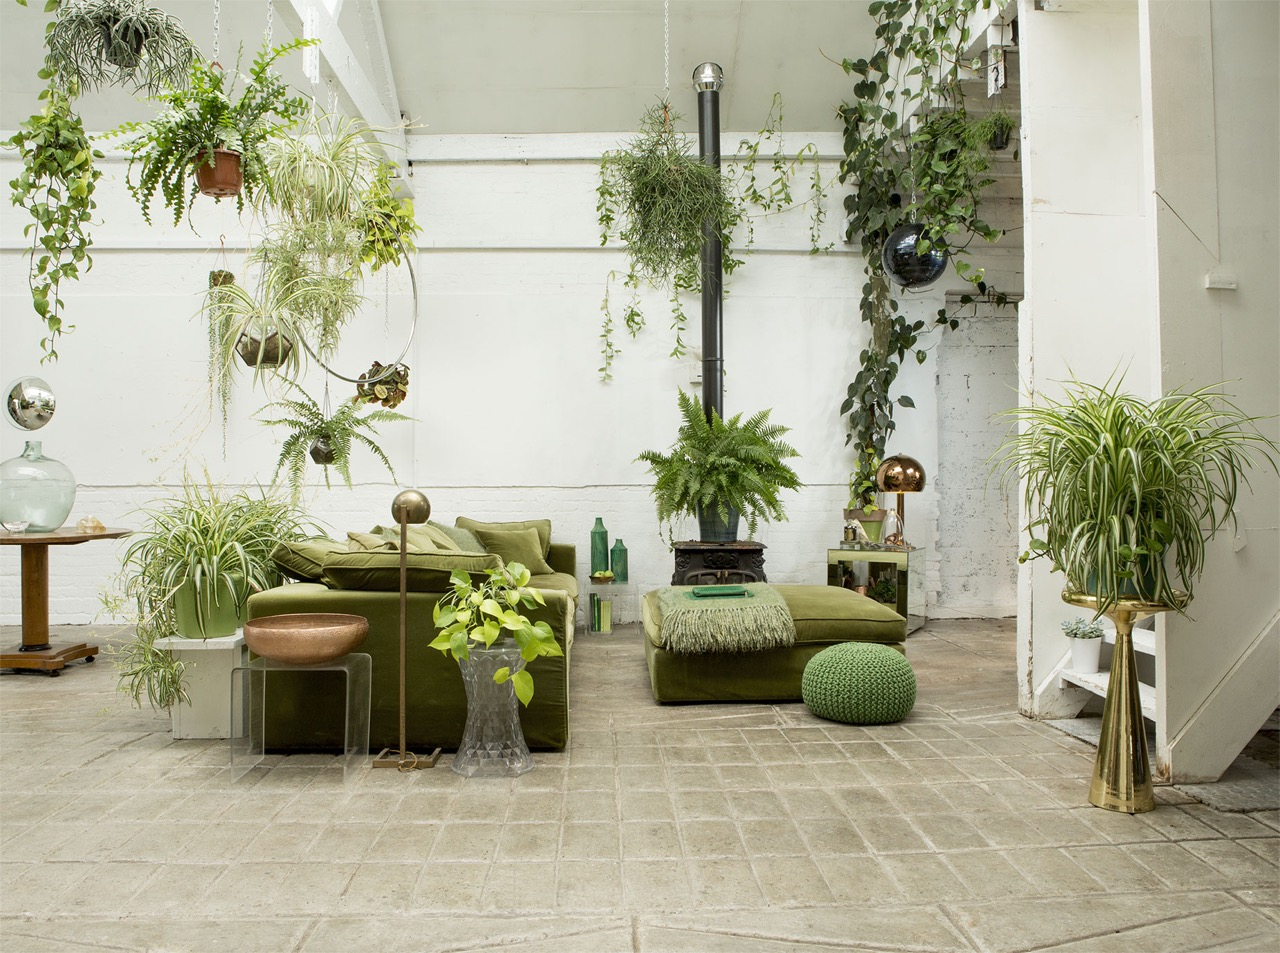 green loft london, green loft, indoor plants, indoor planters and pots, italianbark interior design blog